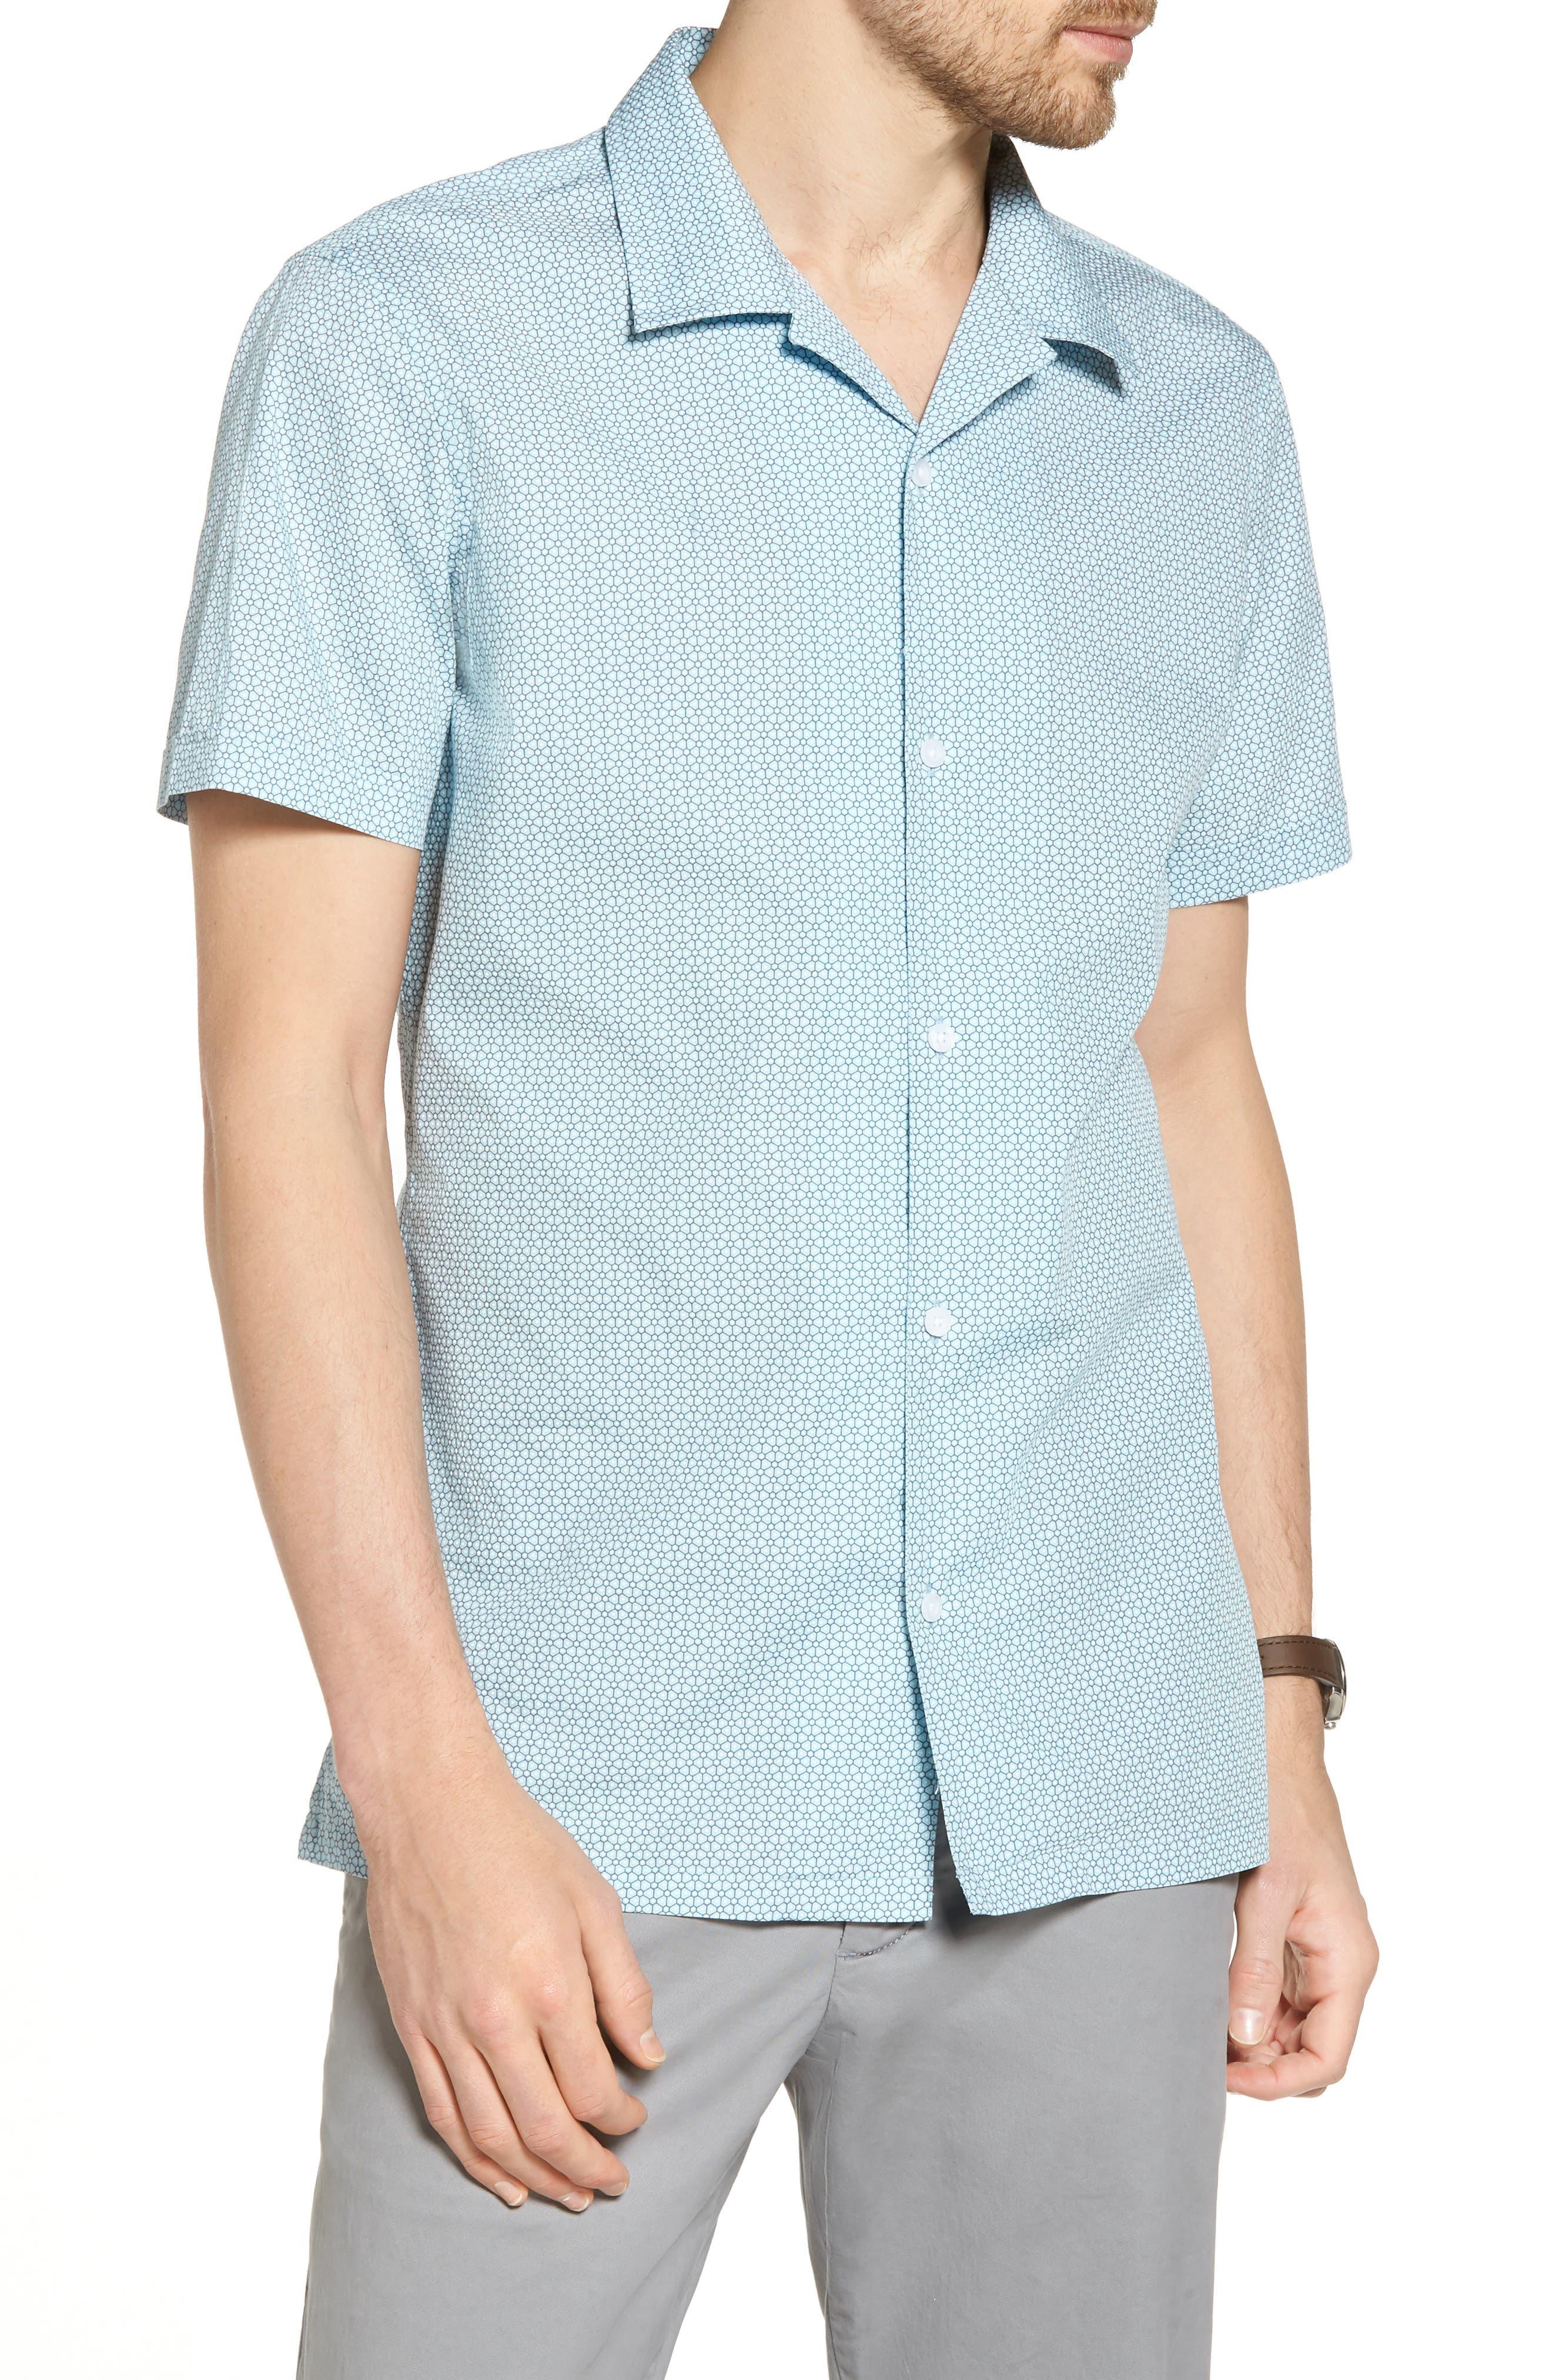 Trim Fit Stretch Geometric Camp Shirt,                             Main thumbnail 1, color,                             Blue Orydalis Honeycomb